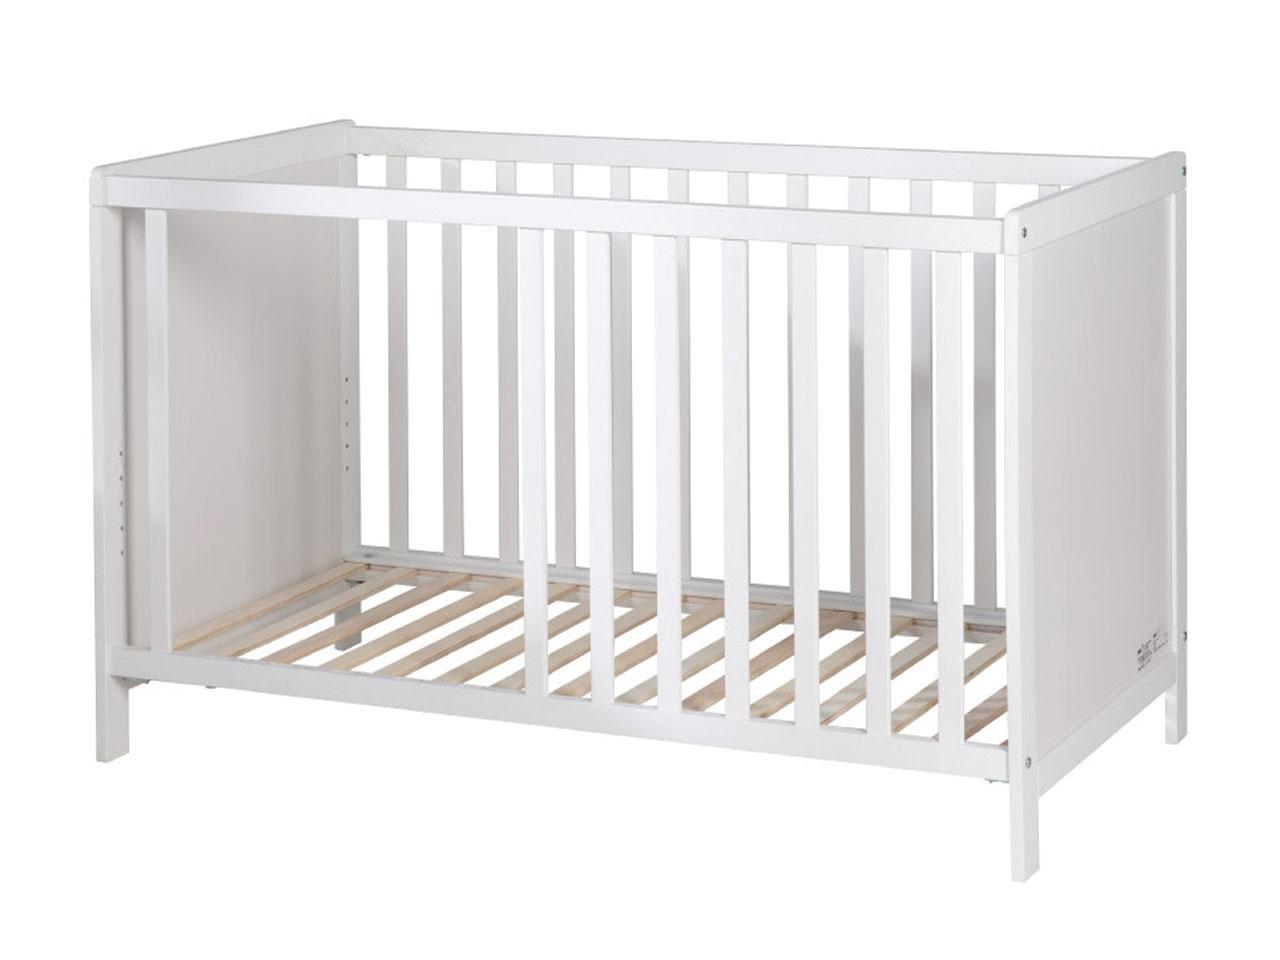 Dětská postýlka ROBA 60 x 120 cm, bílá